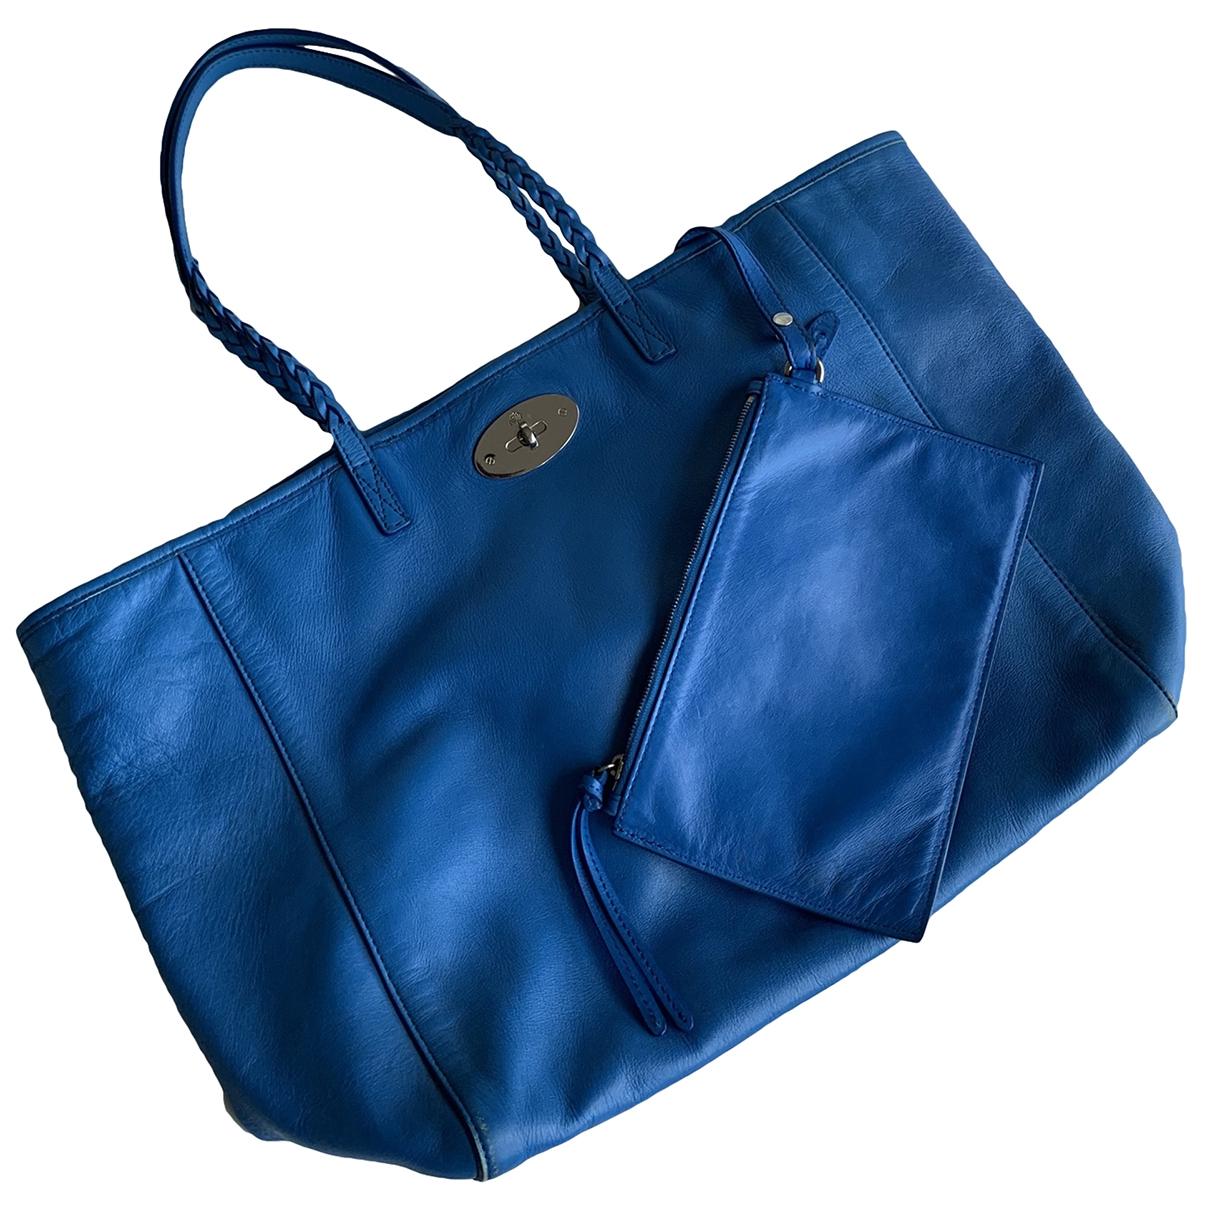 Mulberry \N Handtasche in  Blau Leder